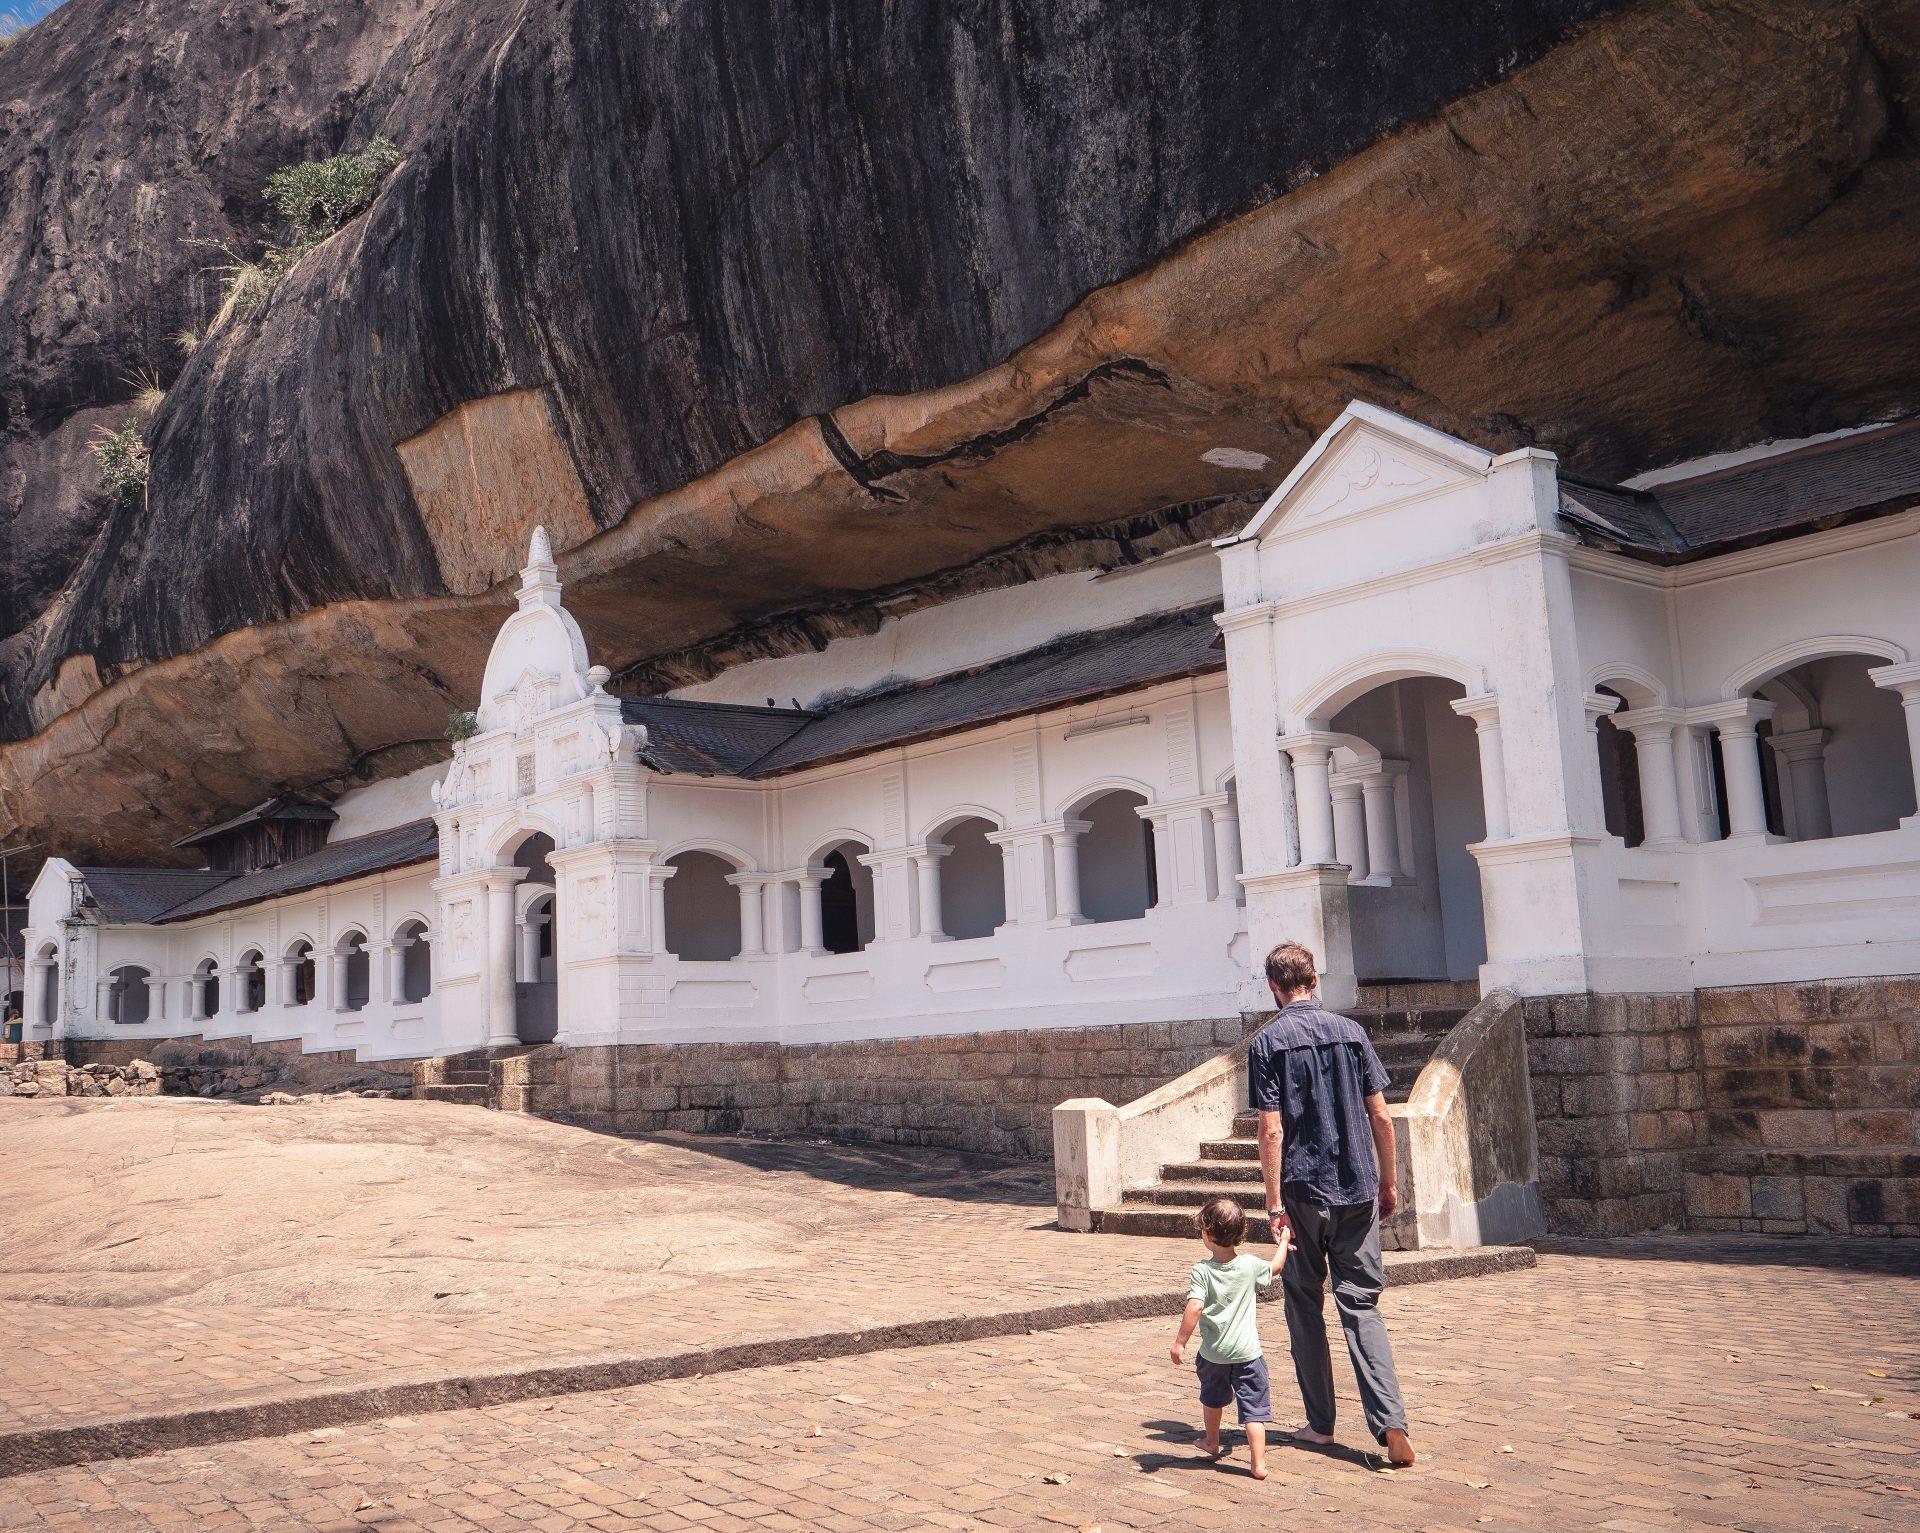 Temple d'or de dambulla au Sri Lanka - grotte sacrée